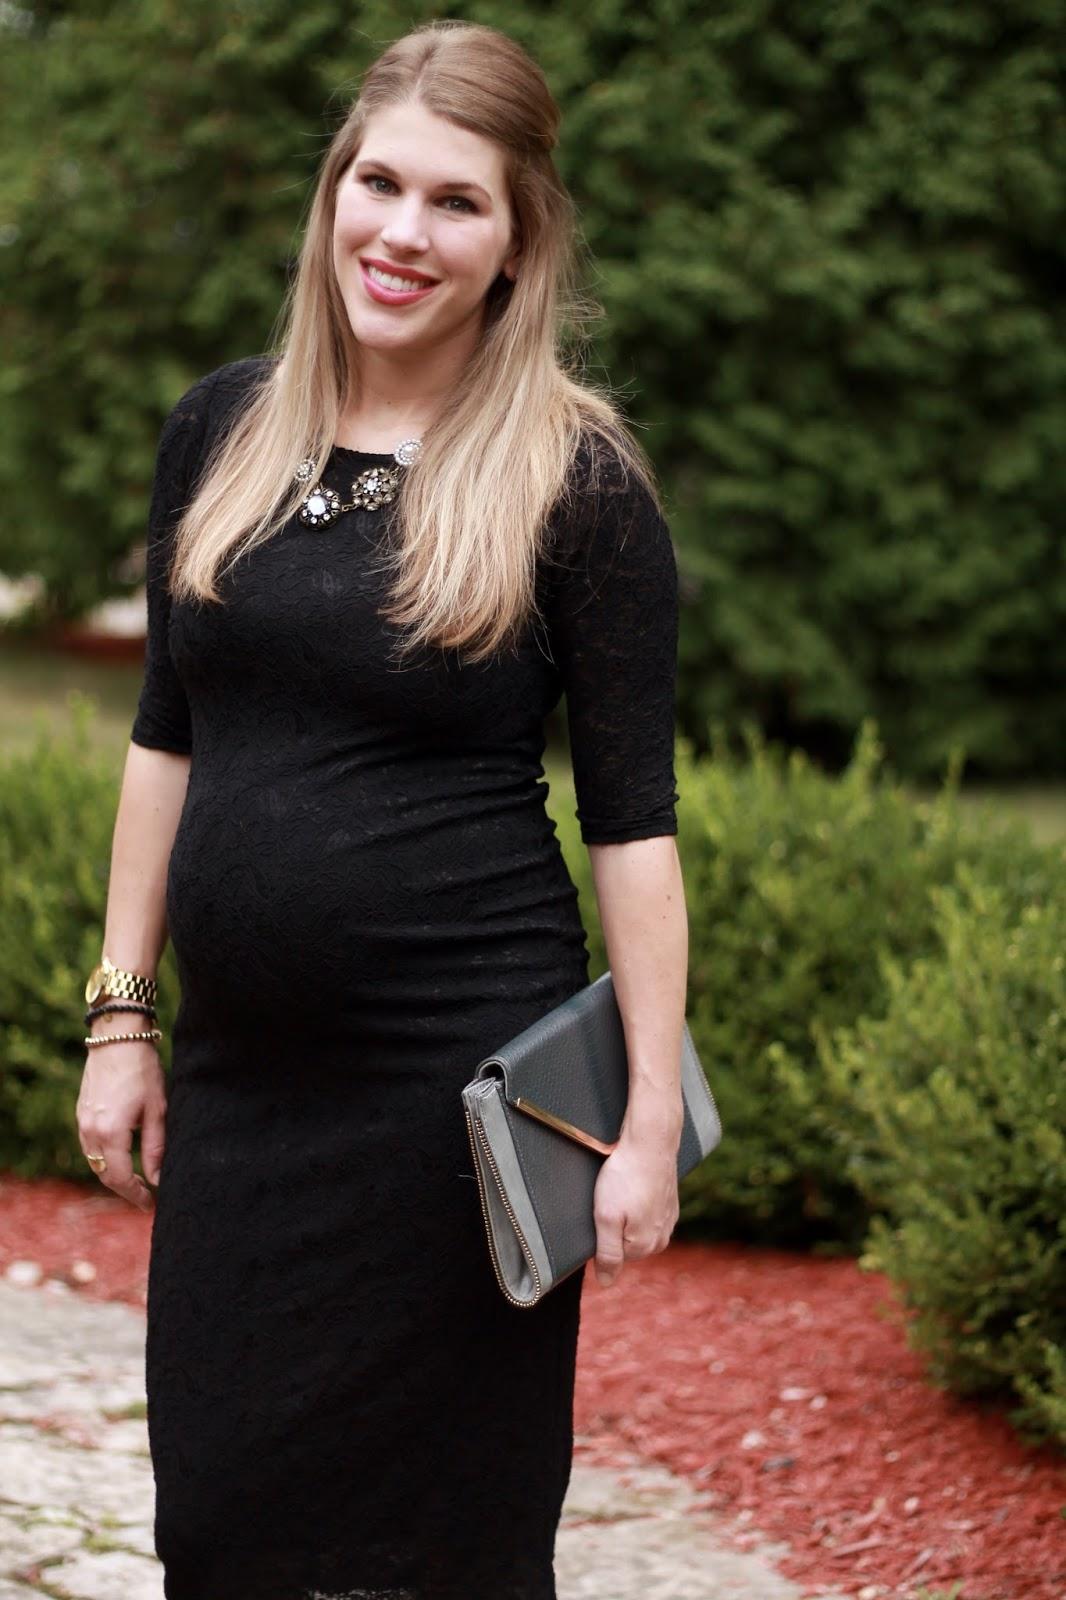 black lace maternity dress, green heels, grey clutch, vintage necklace, maternity wedding look